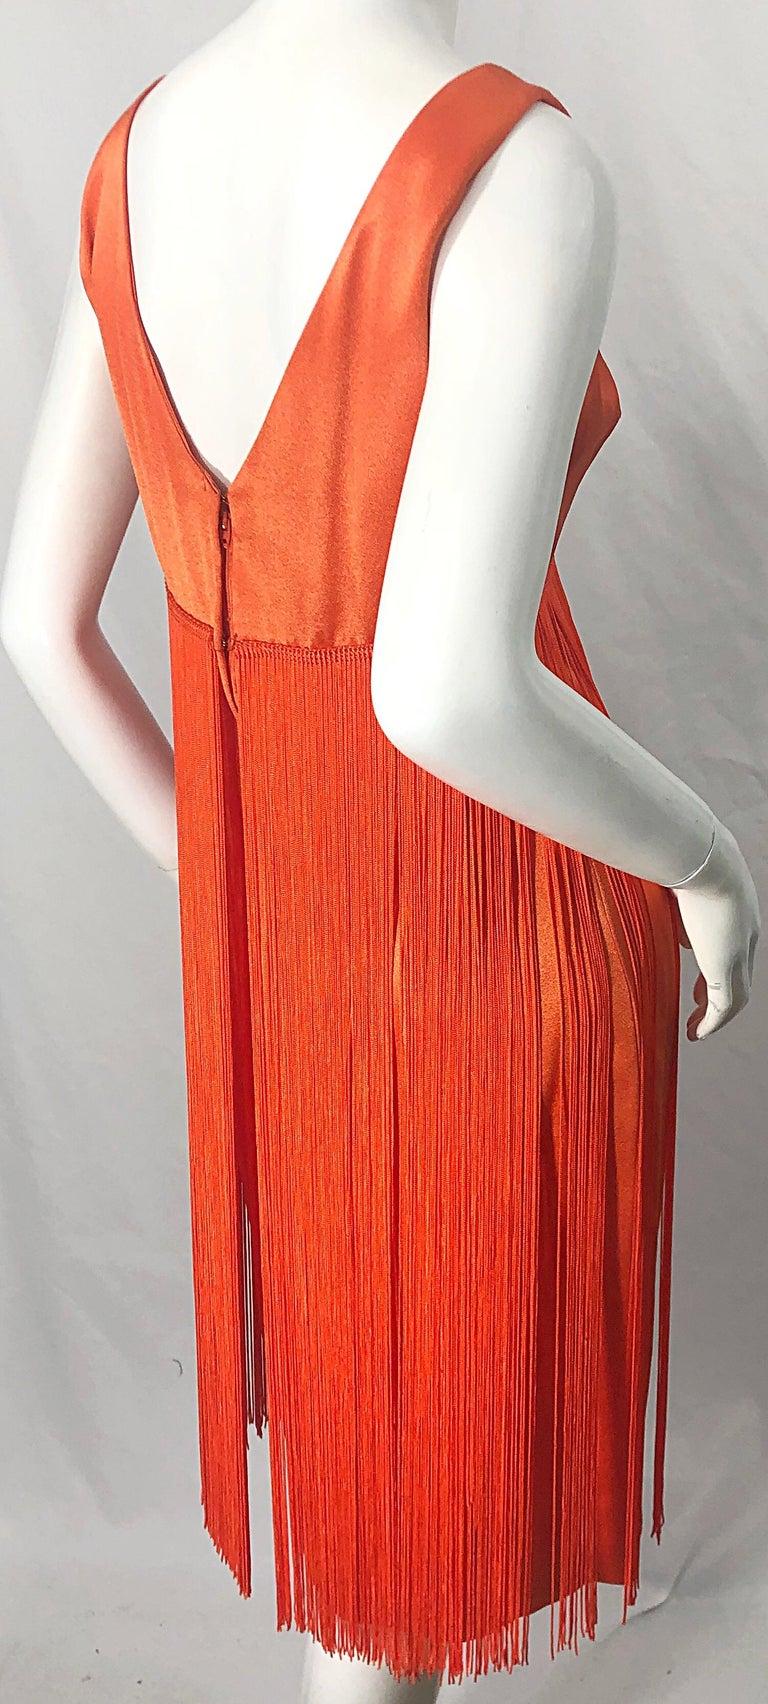 1960s Joseph Magnin Neon Orange Fully Fringed Vintage 60s Flapper Dress For Sale 3